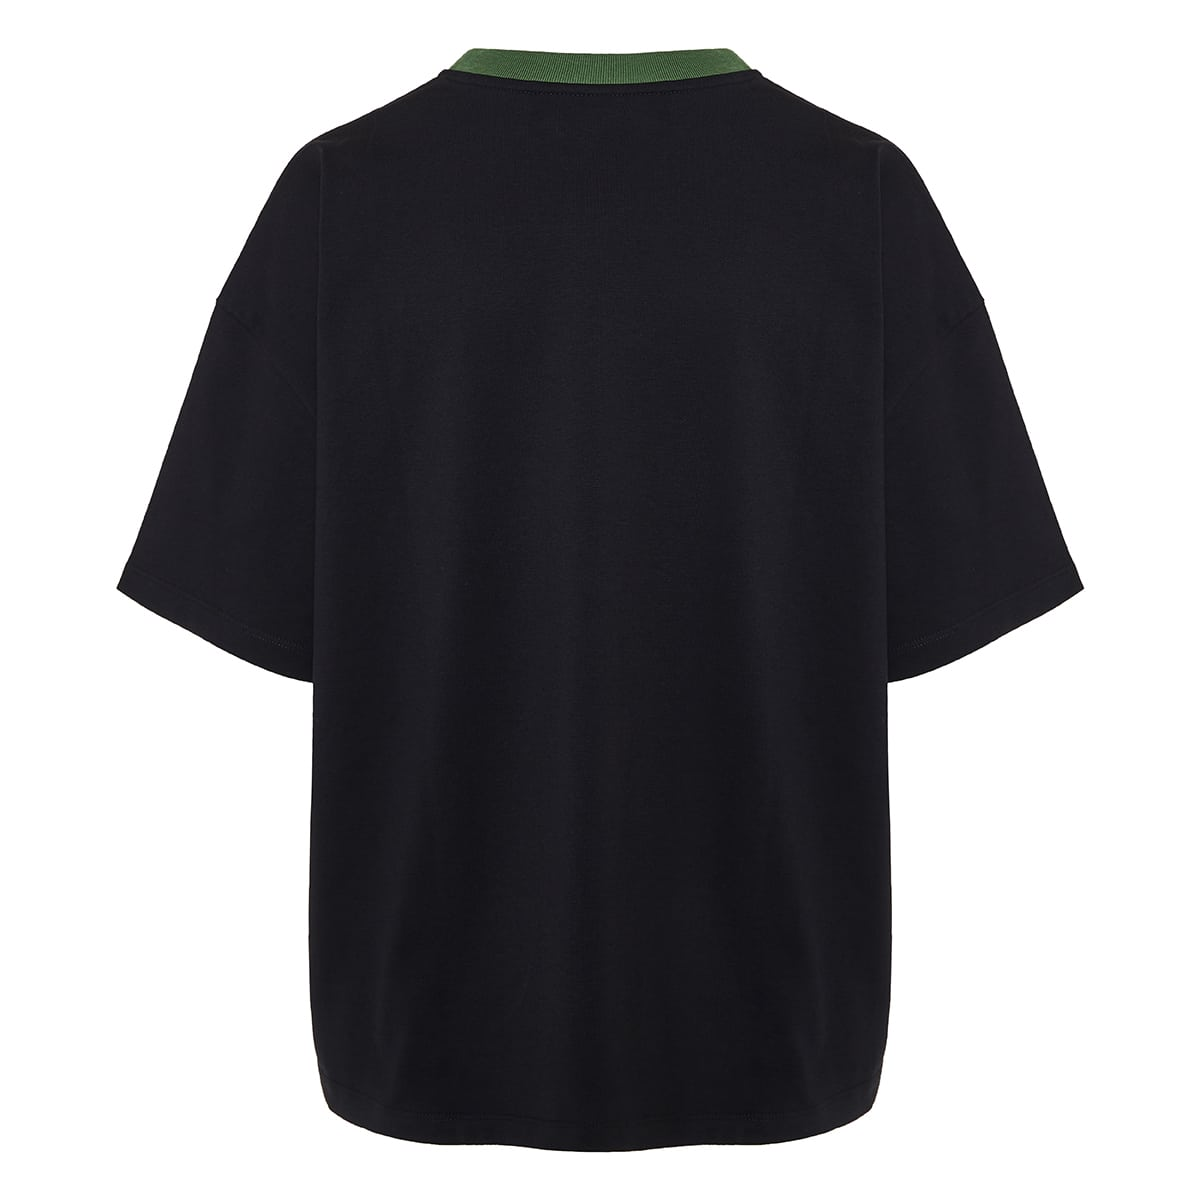 Oversized logo cotton t-shirt